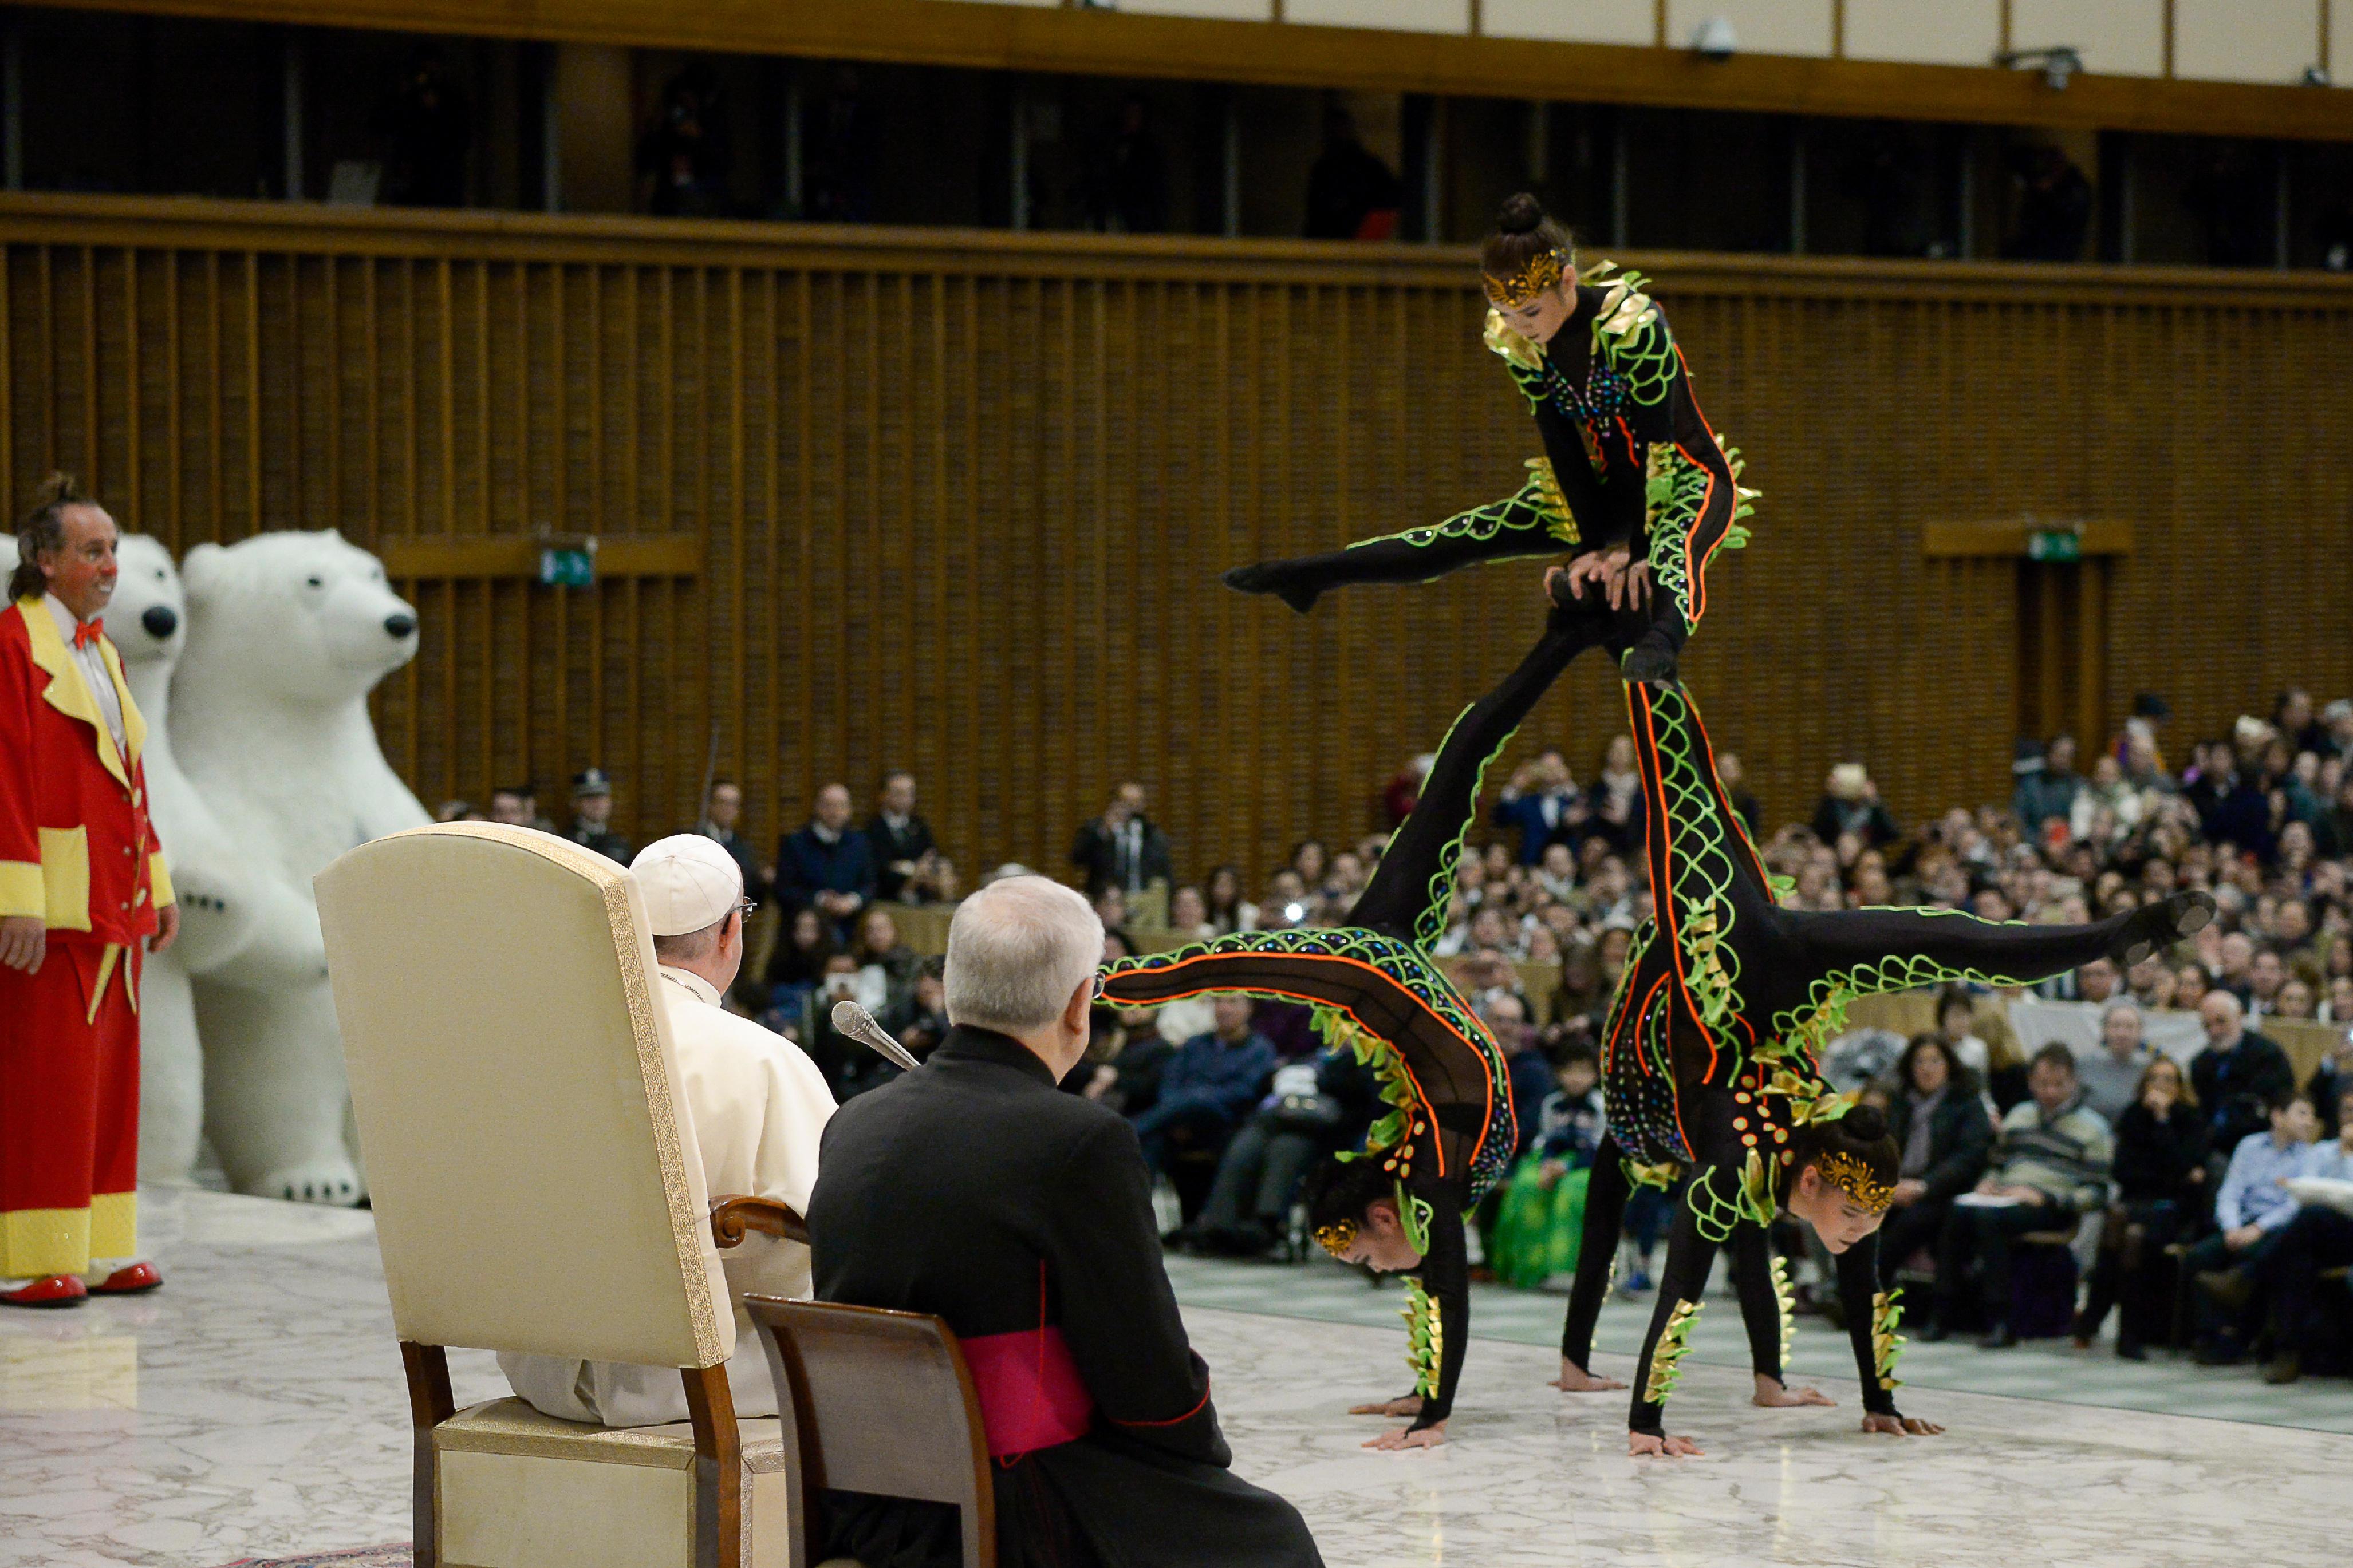 Golden Circus, Audience générale 27/12/2017 © Vatican Media